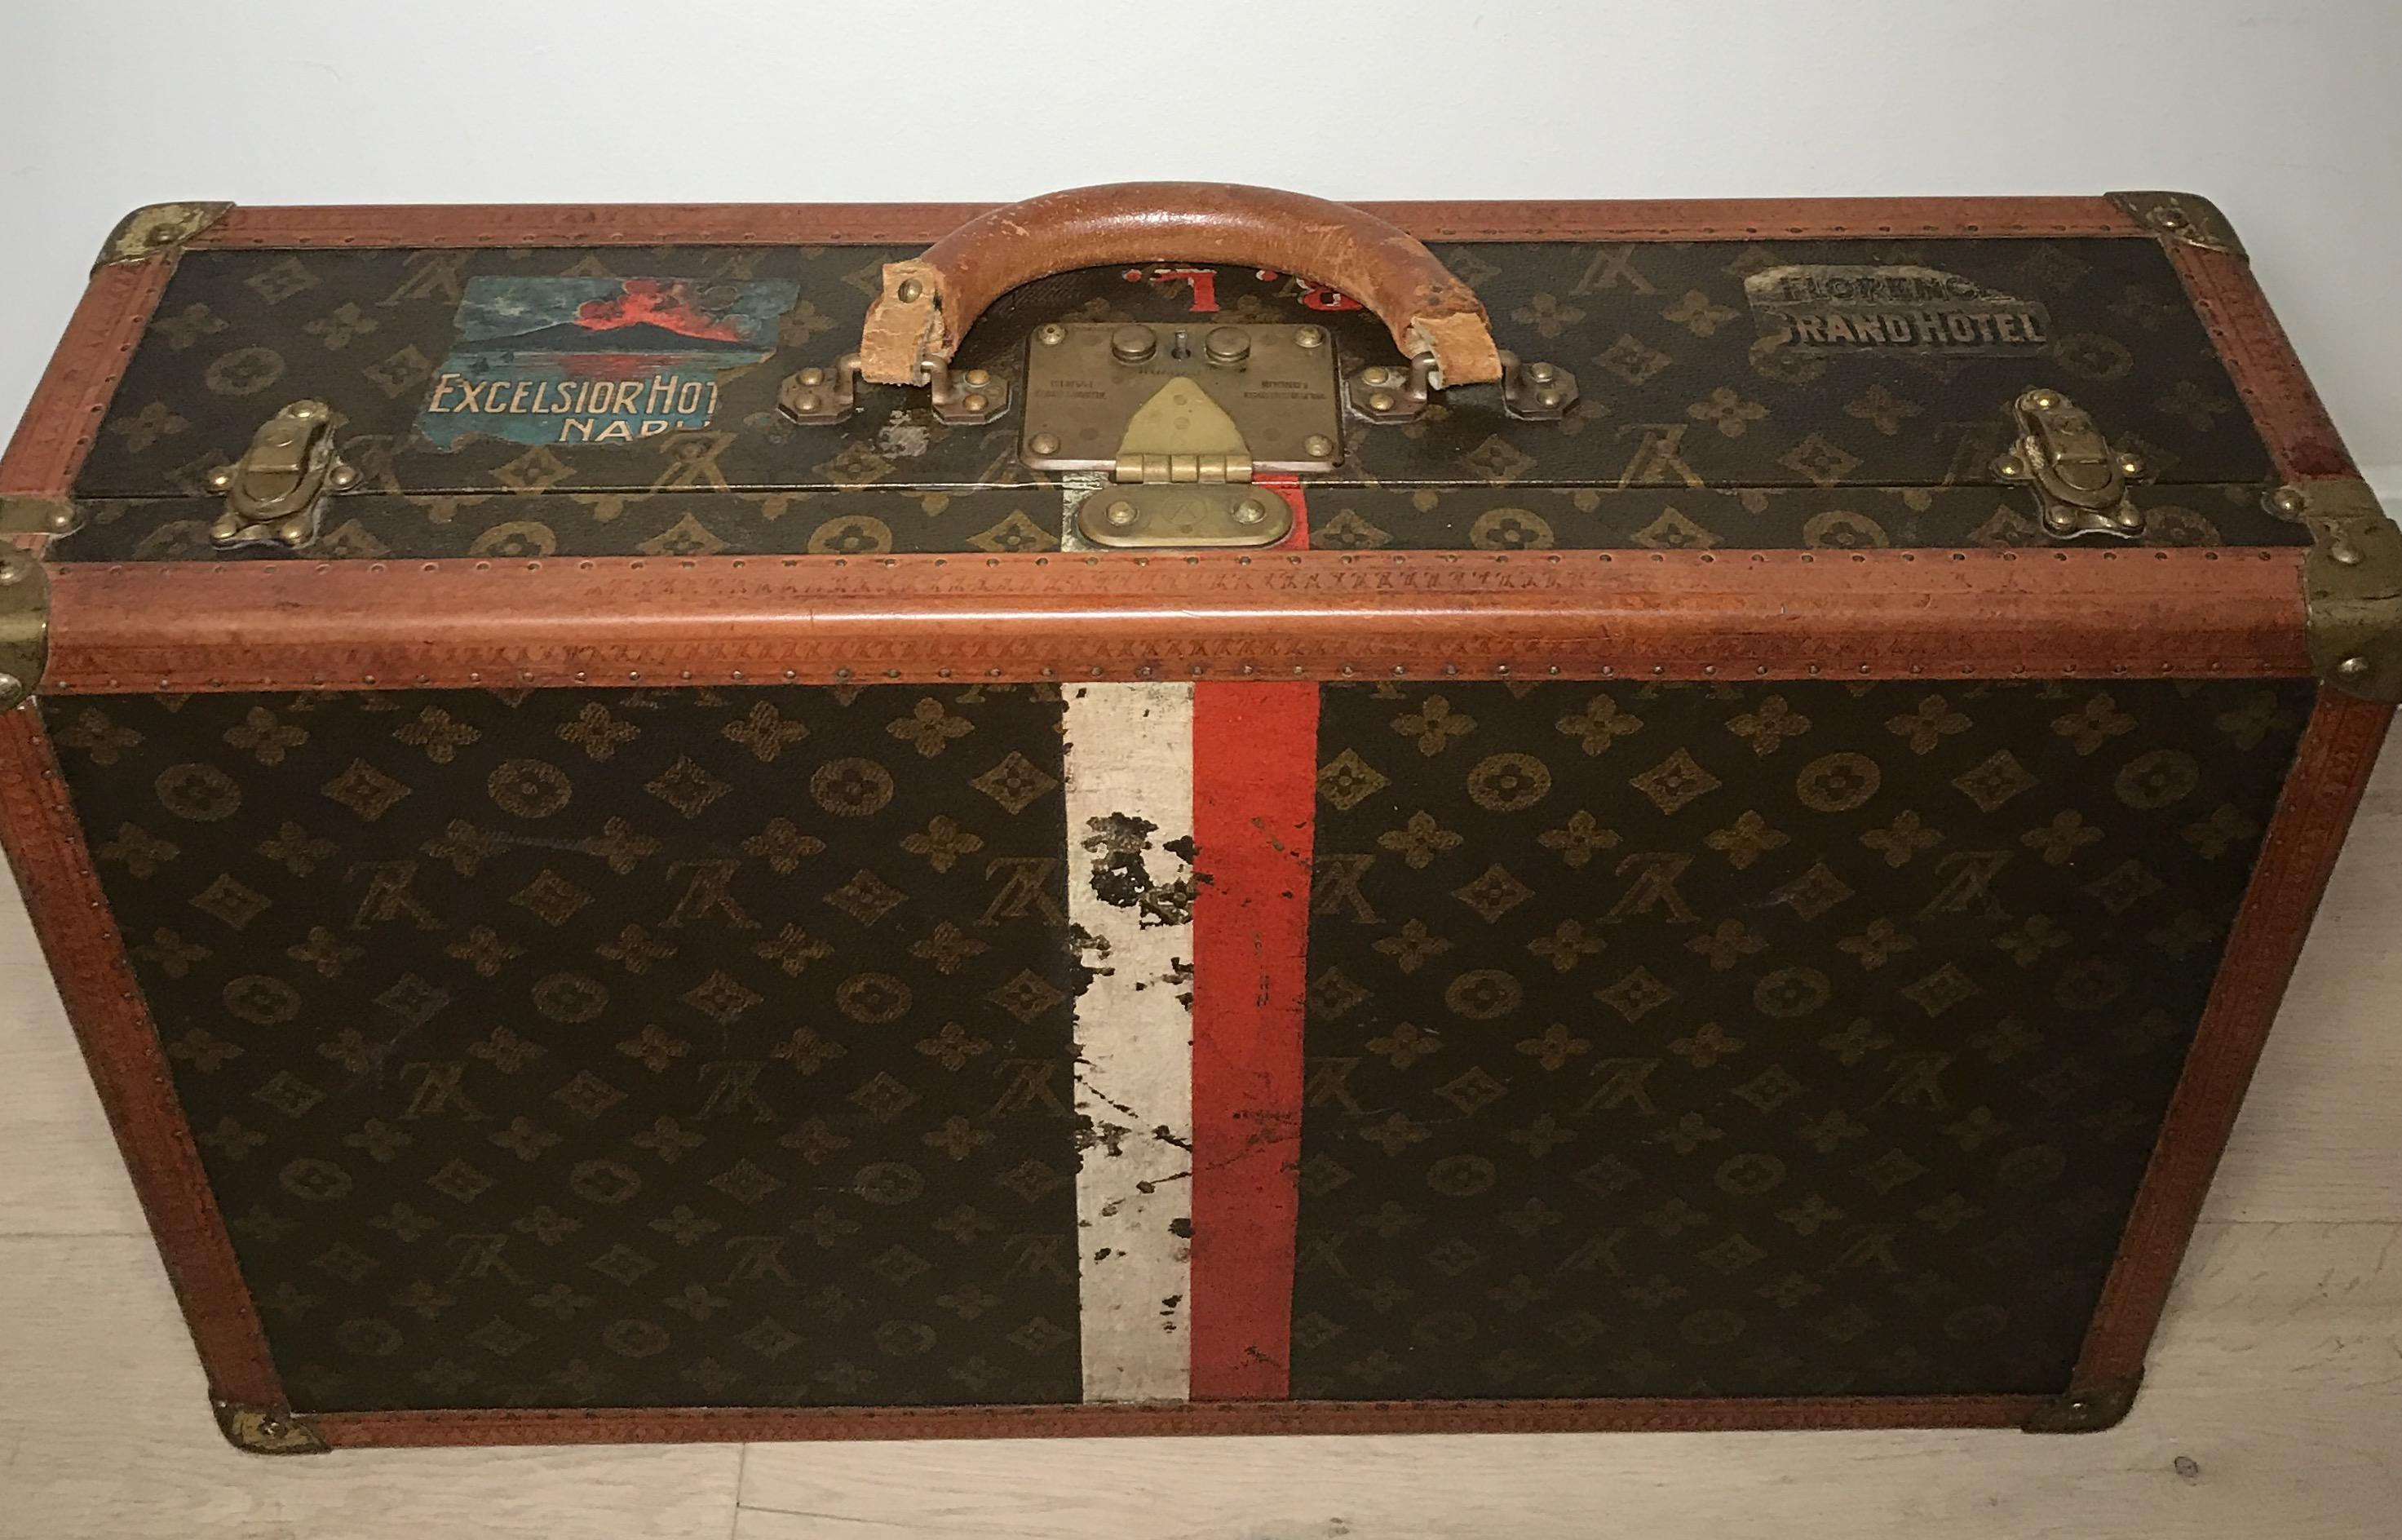 d329c490982f Antique Louis Vuitton suitcase red white stripe - Pinth Vintage Luggage